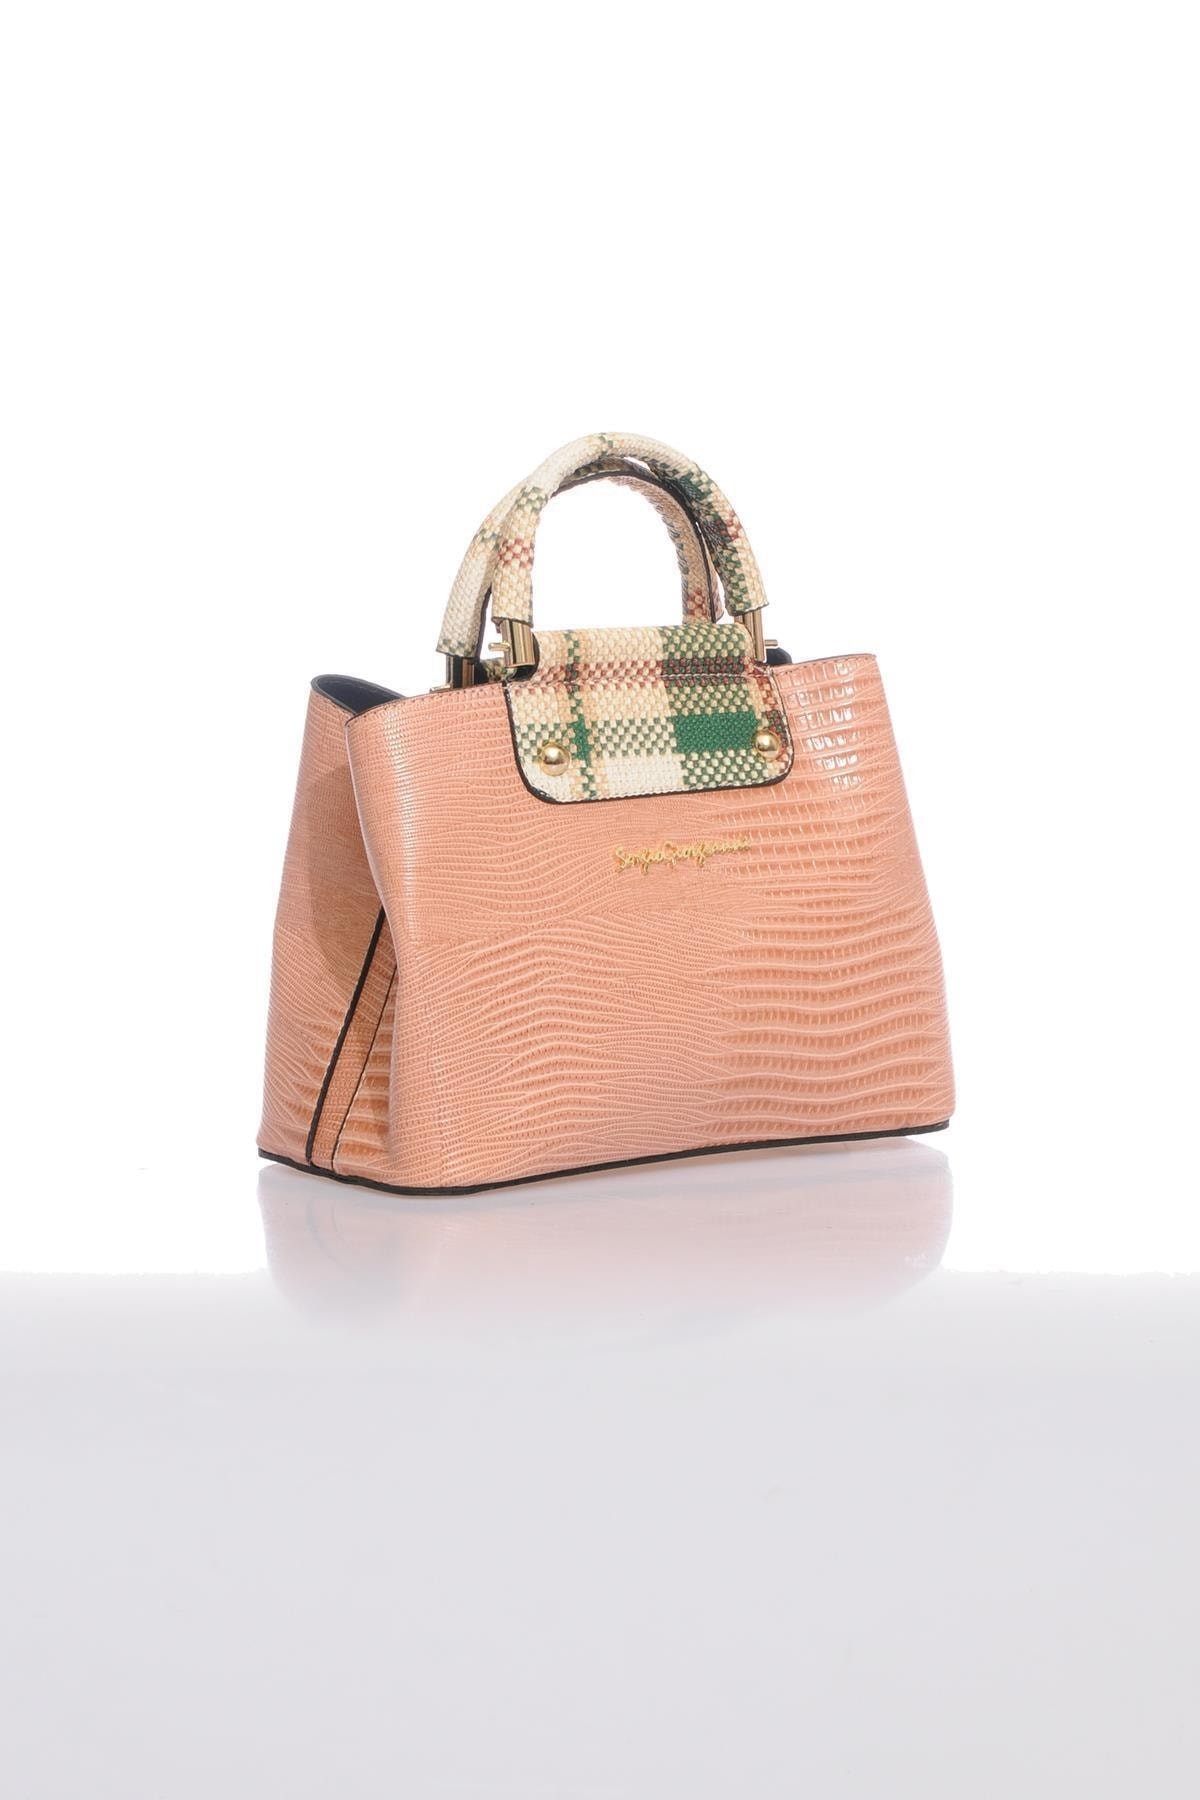 Sergio Giorgianni Luxury Sg0716 Pudra Kadın Omuz Çantası 2